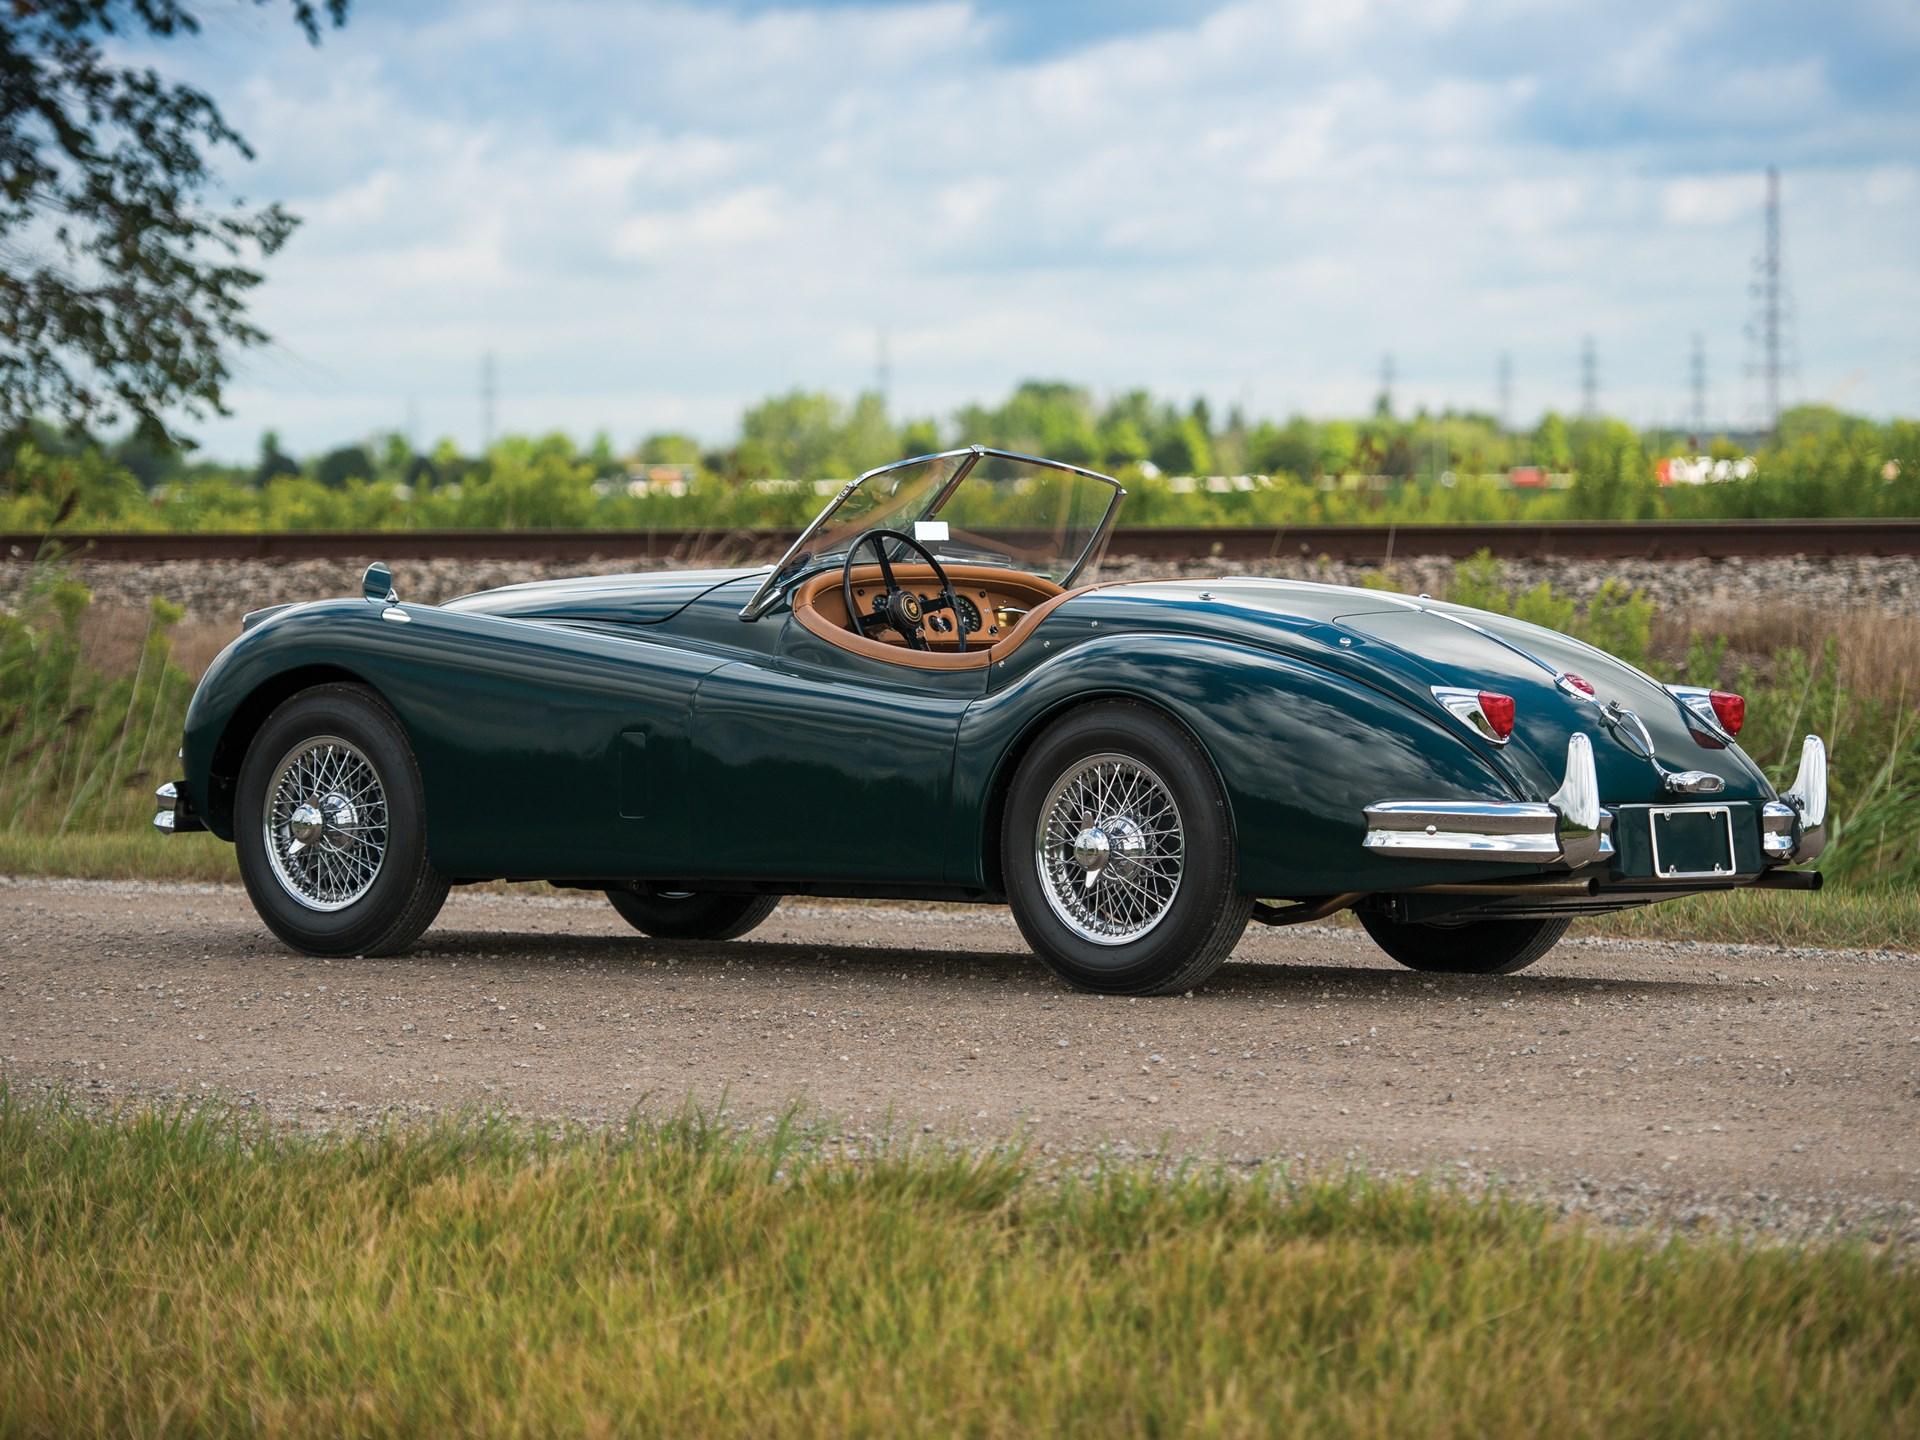 RM Sotheby's - 1955 Jaguar XK 140 MC Roadster | Hershey 2017  |1955 Jaguar Roadster